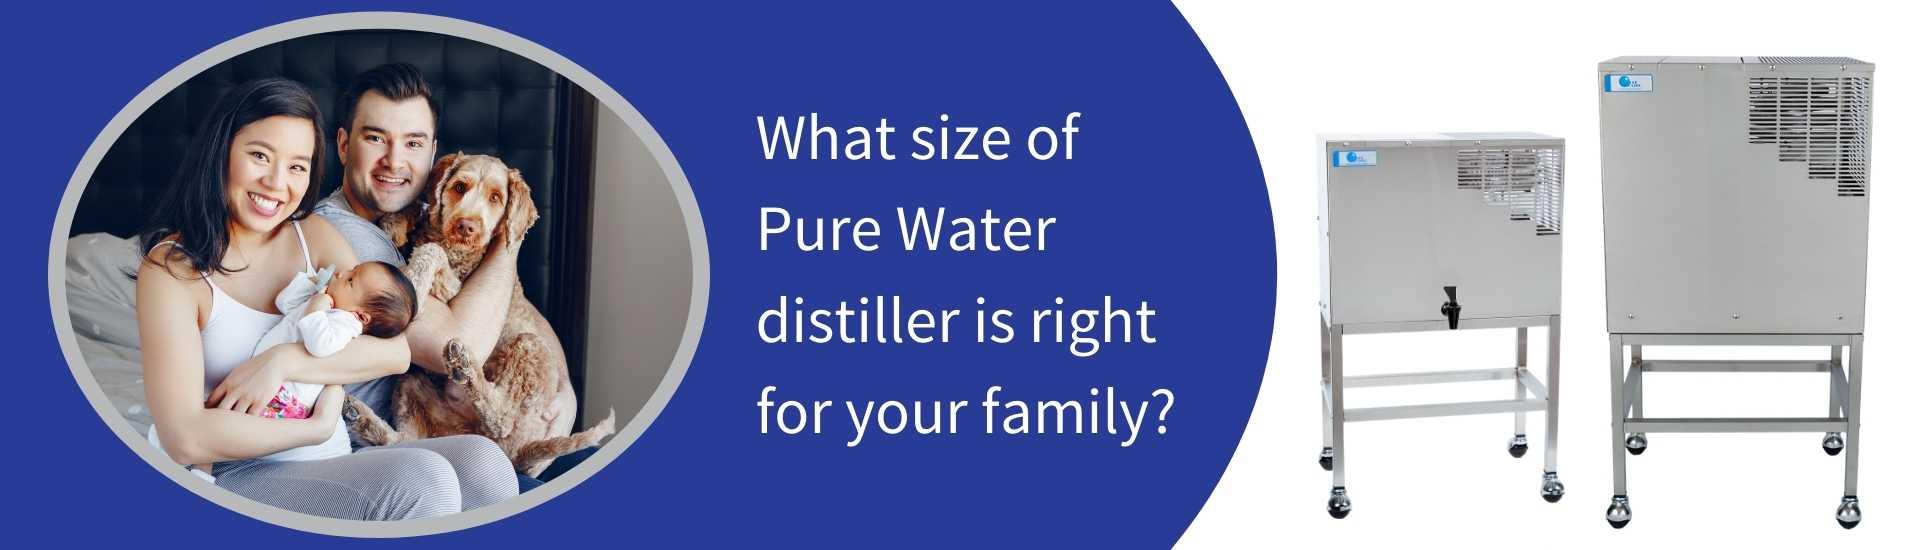 What size of water distiller should I get